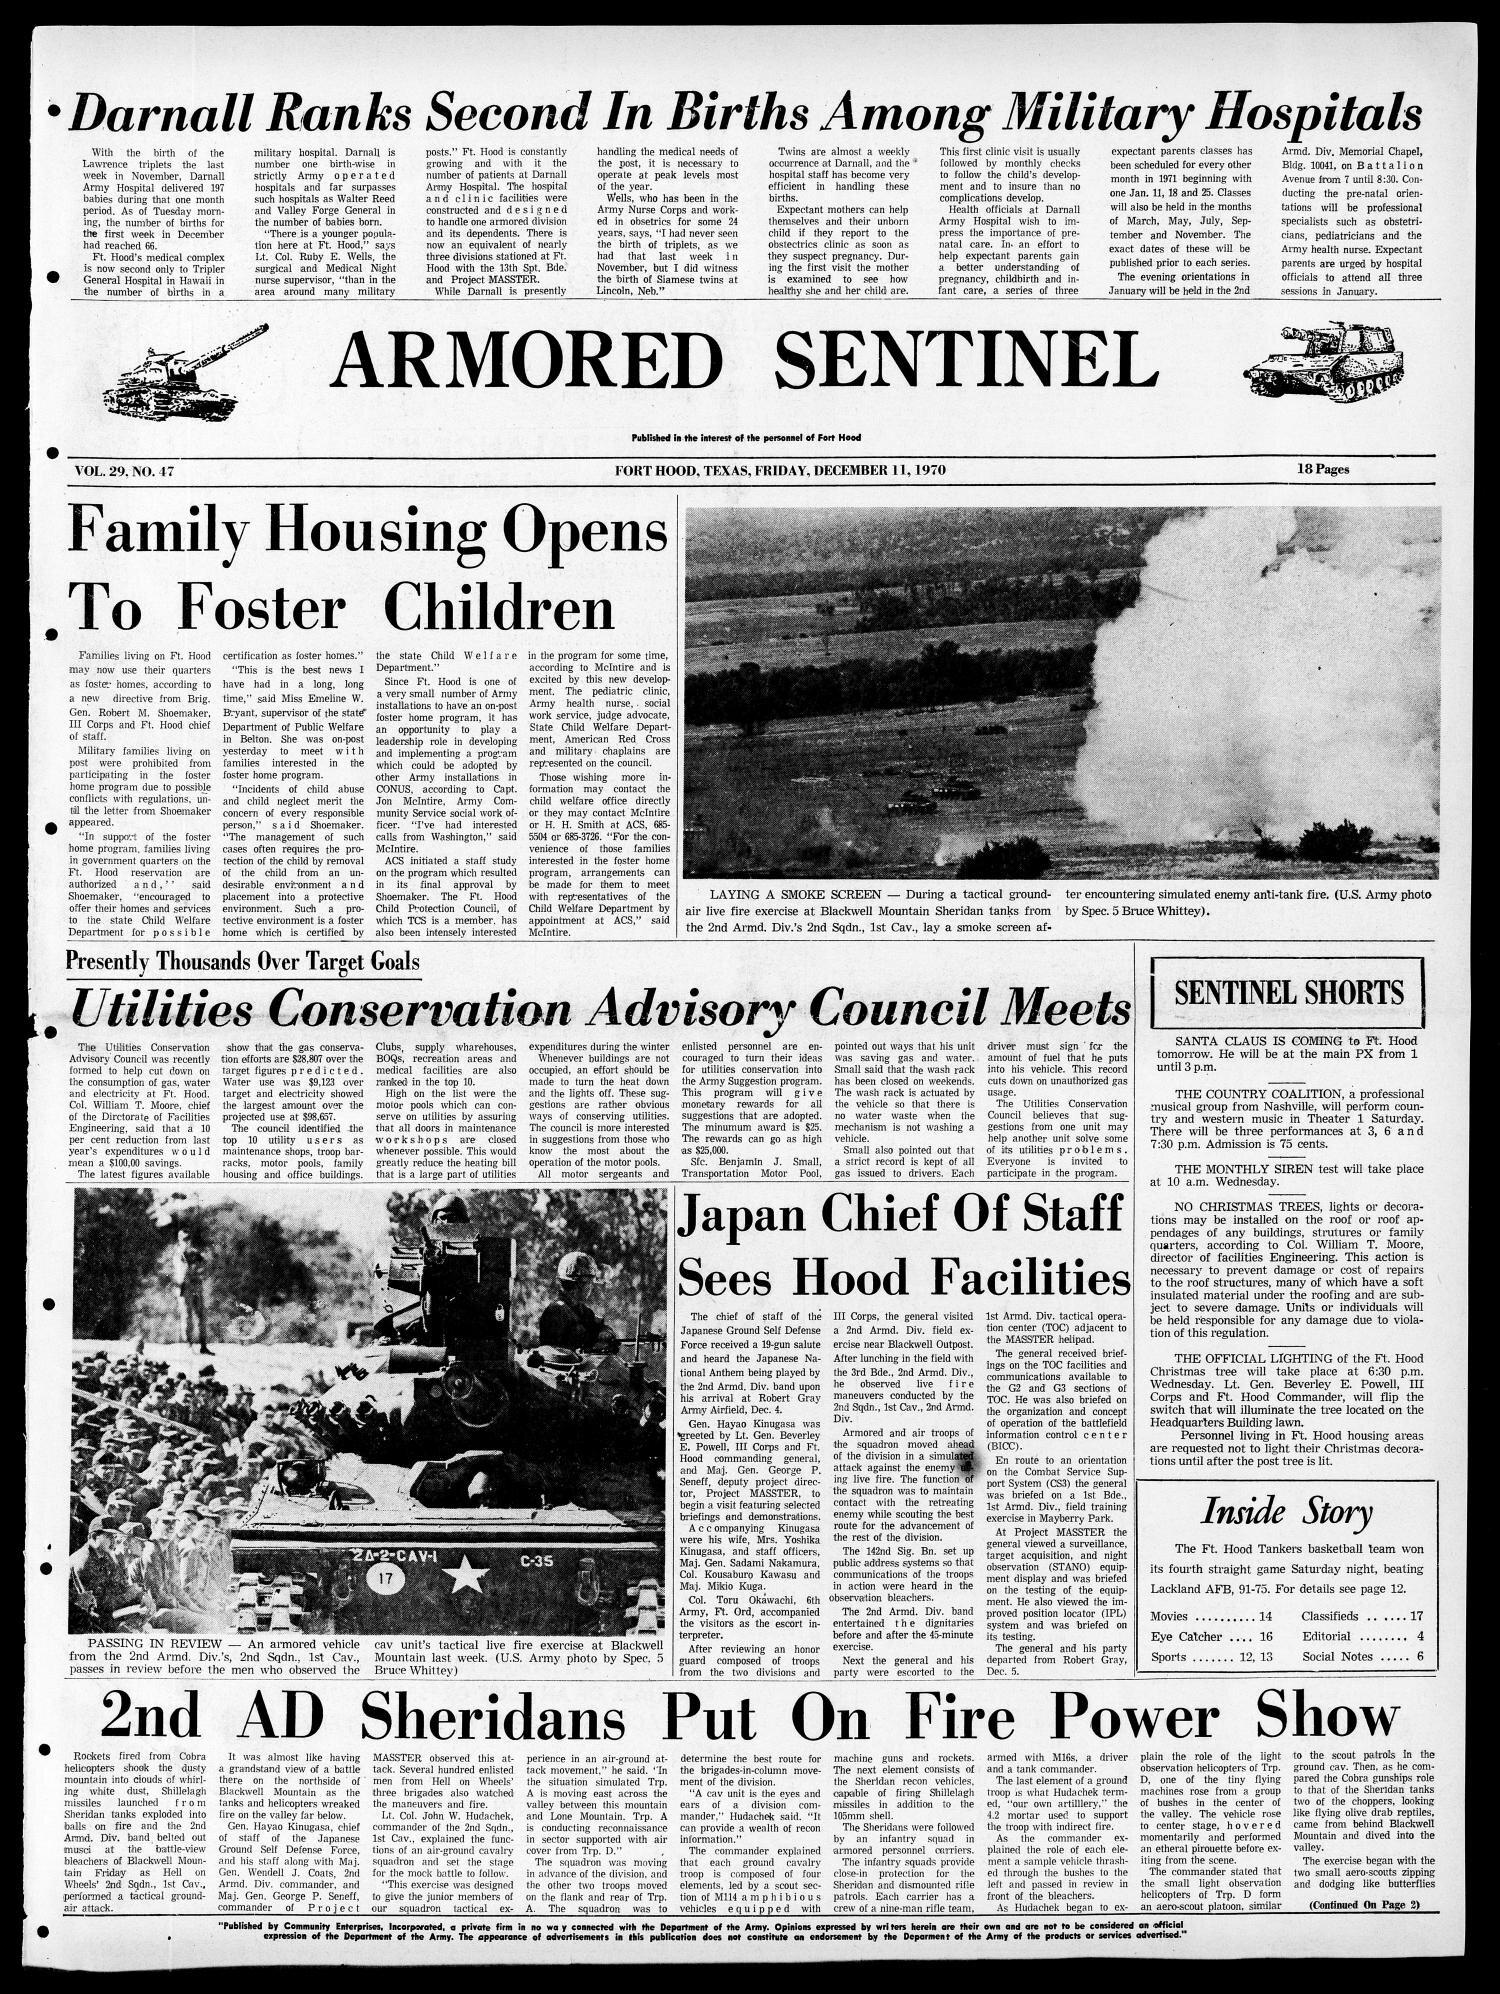 ARMORED SENTINEL_11 DEC 1970.jpg